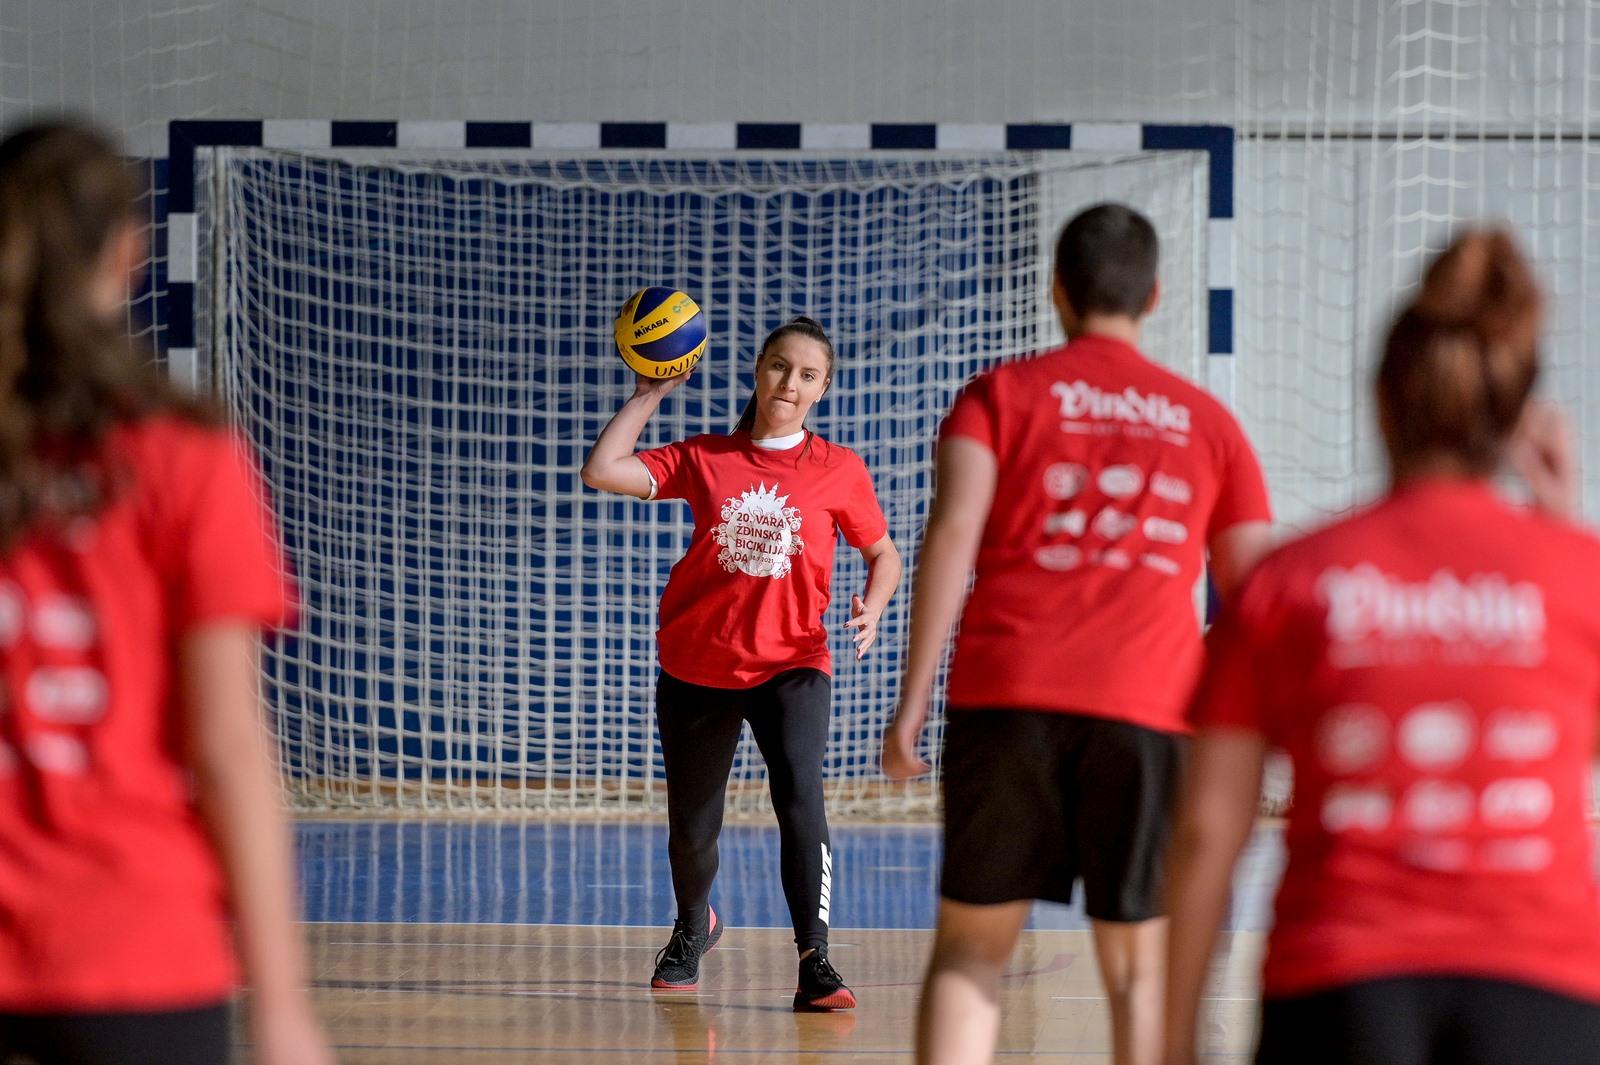 EU_tjedan_sporta (11)